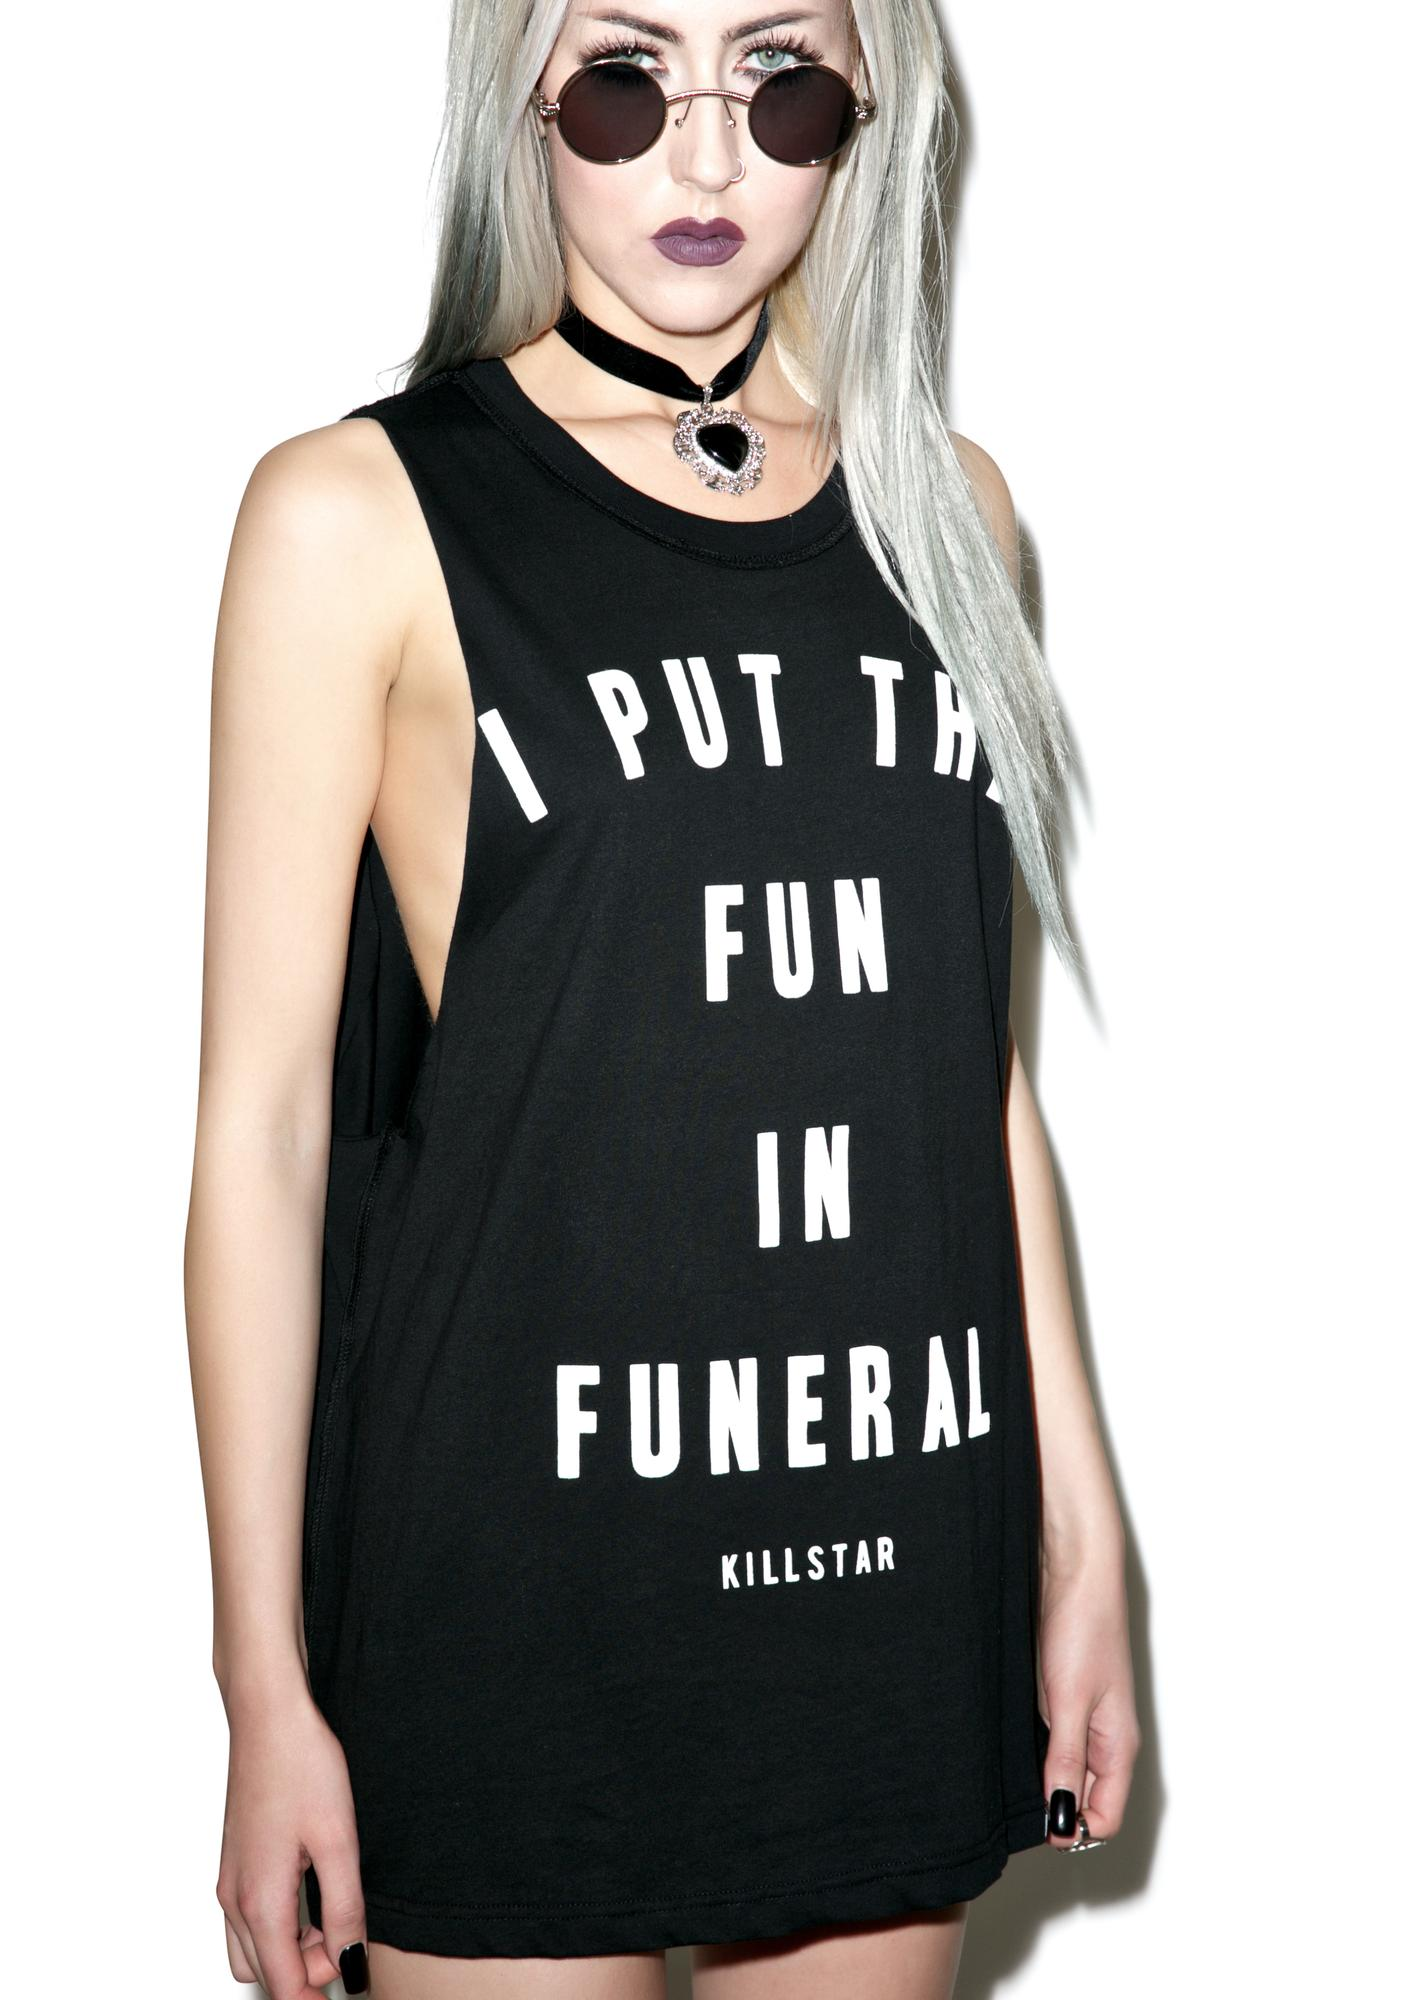 Killstar Funeral Muscle Tank